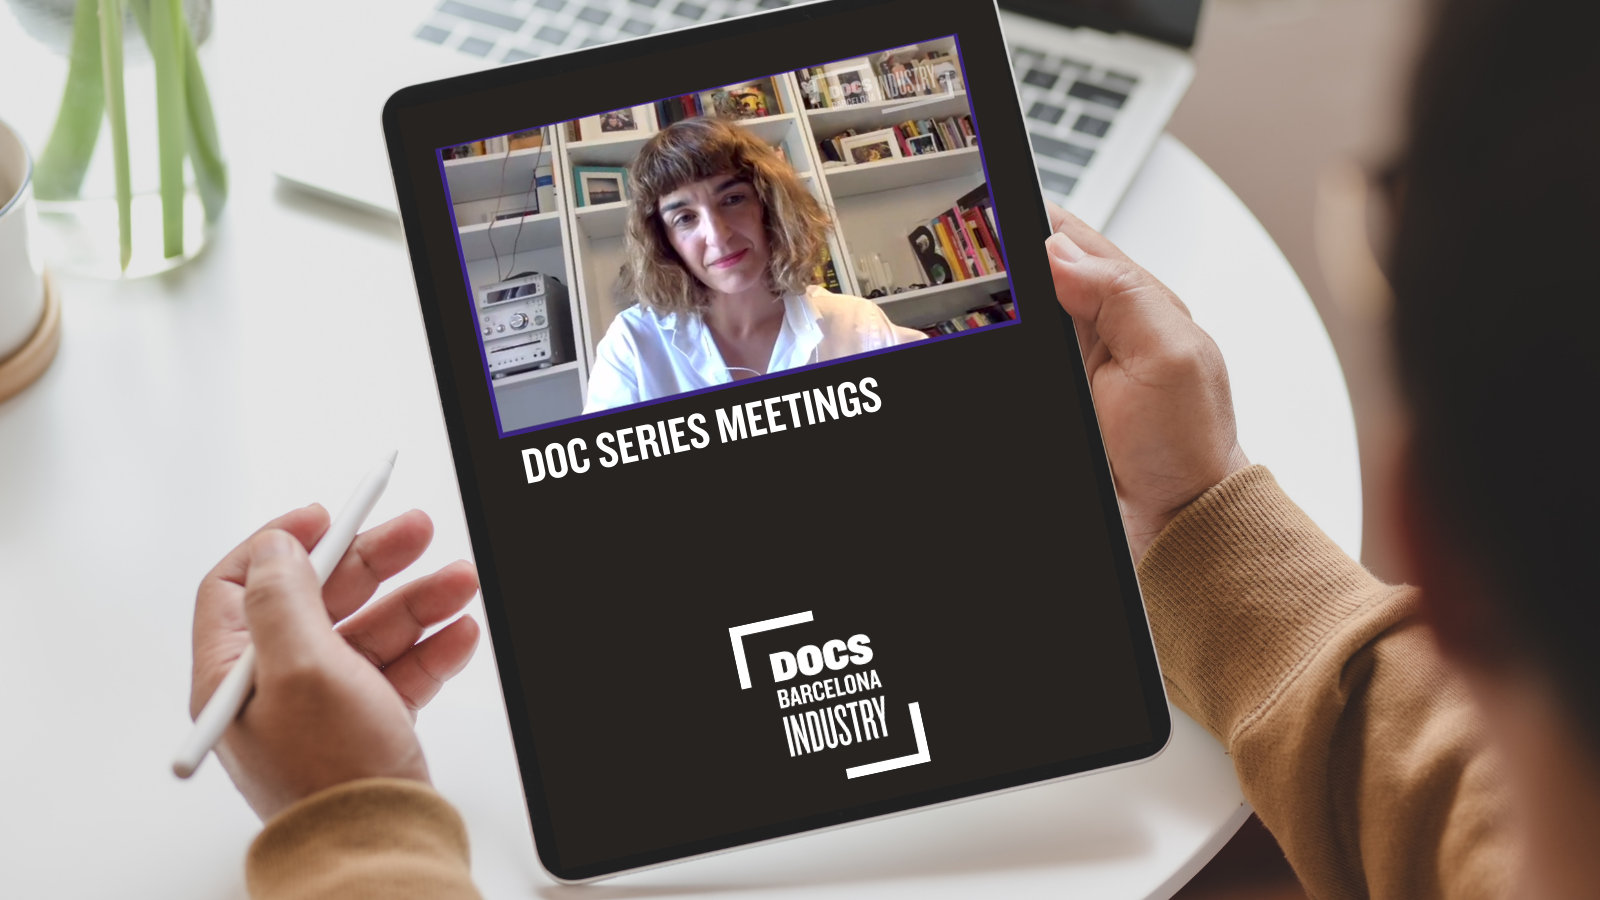 Imágen promocional del Doc Series Meetings